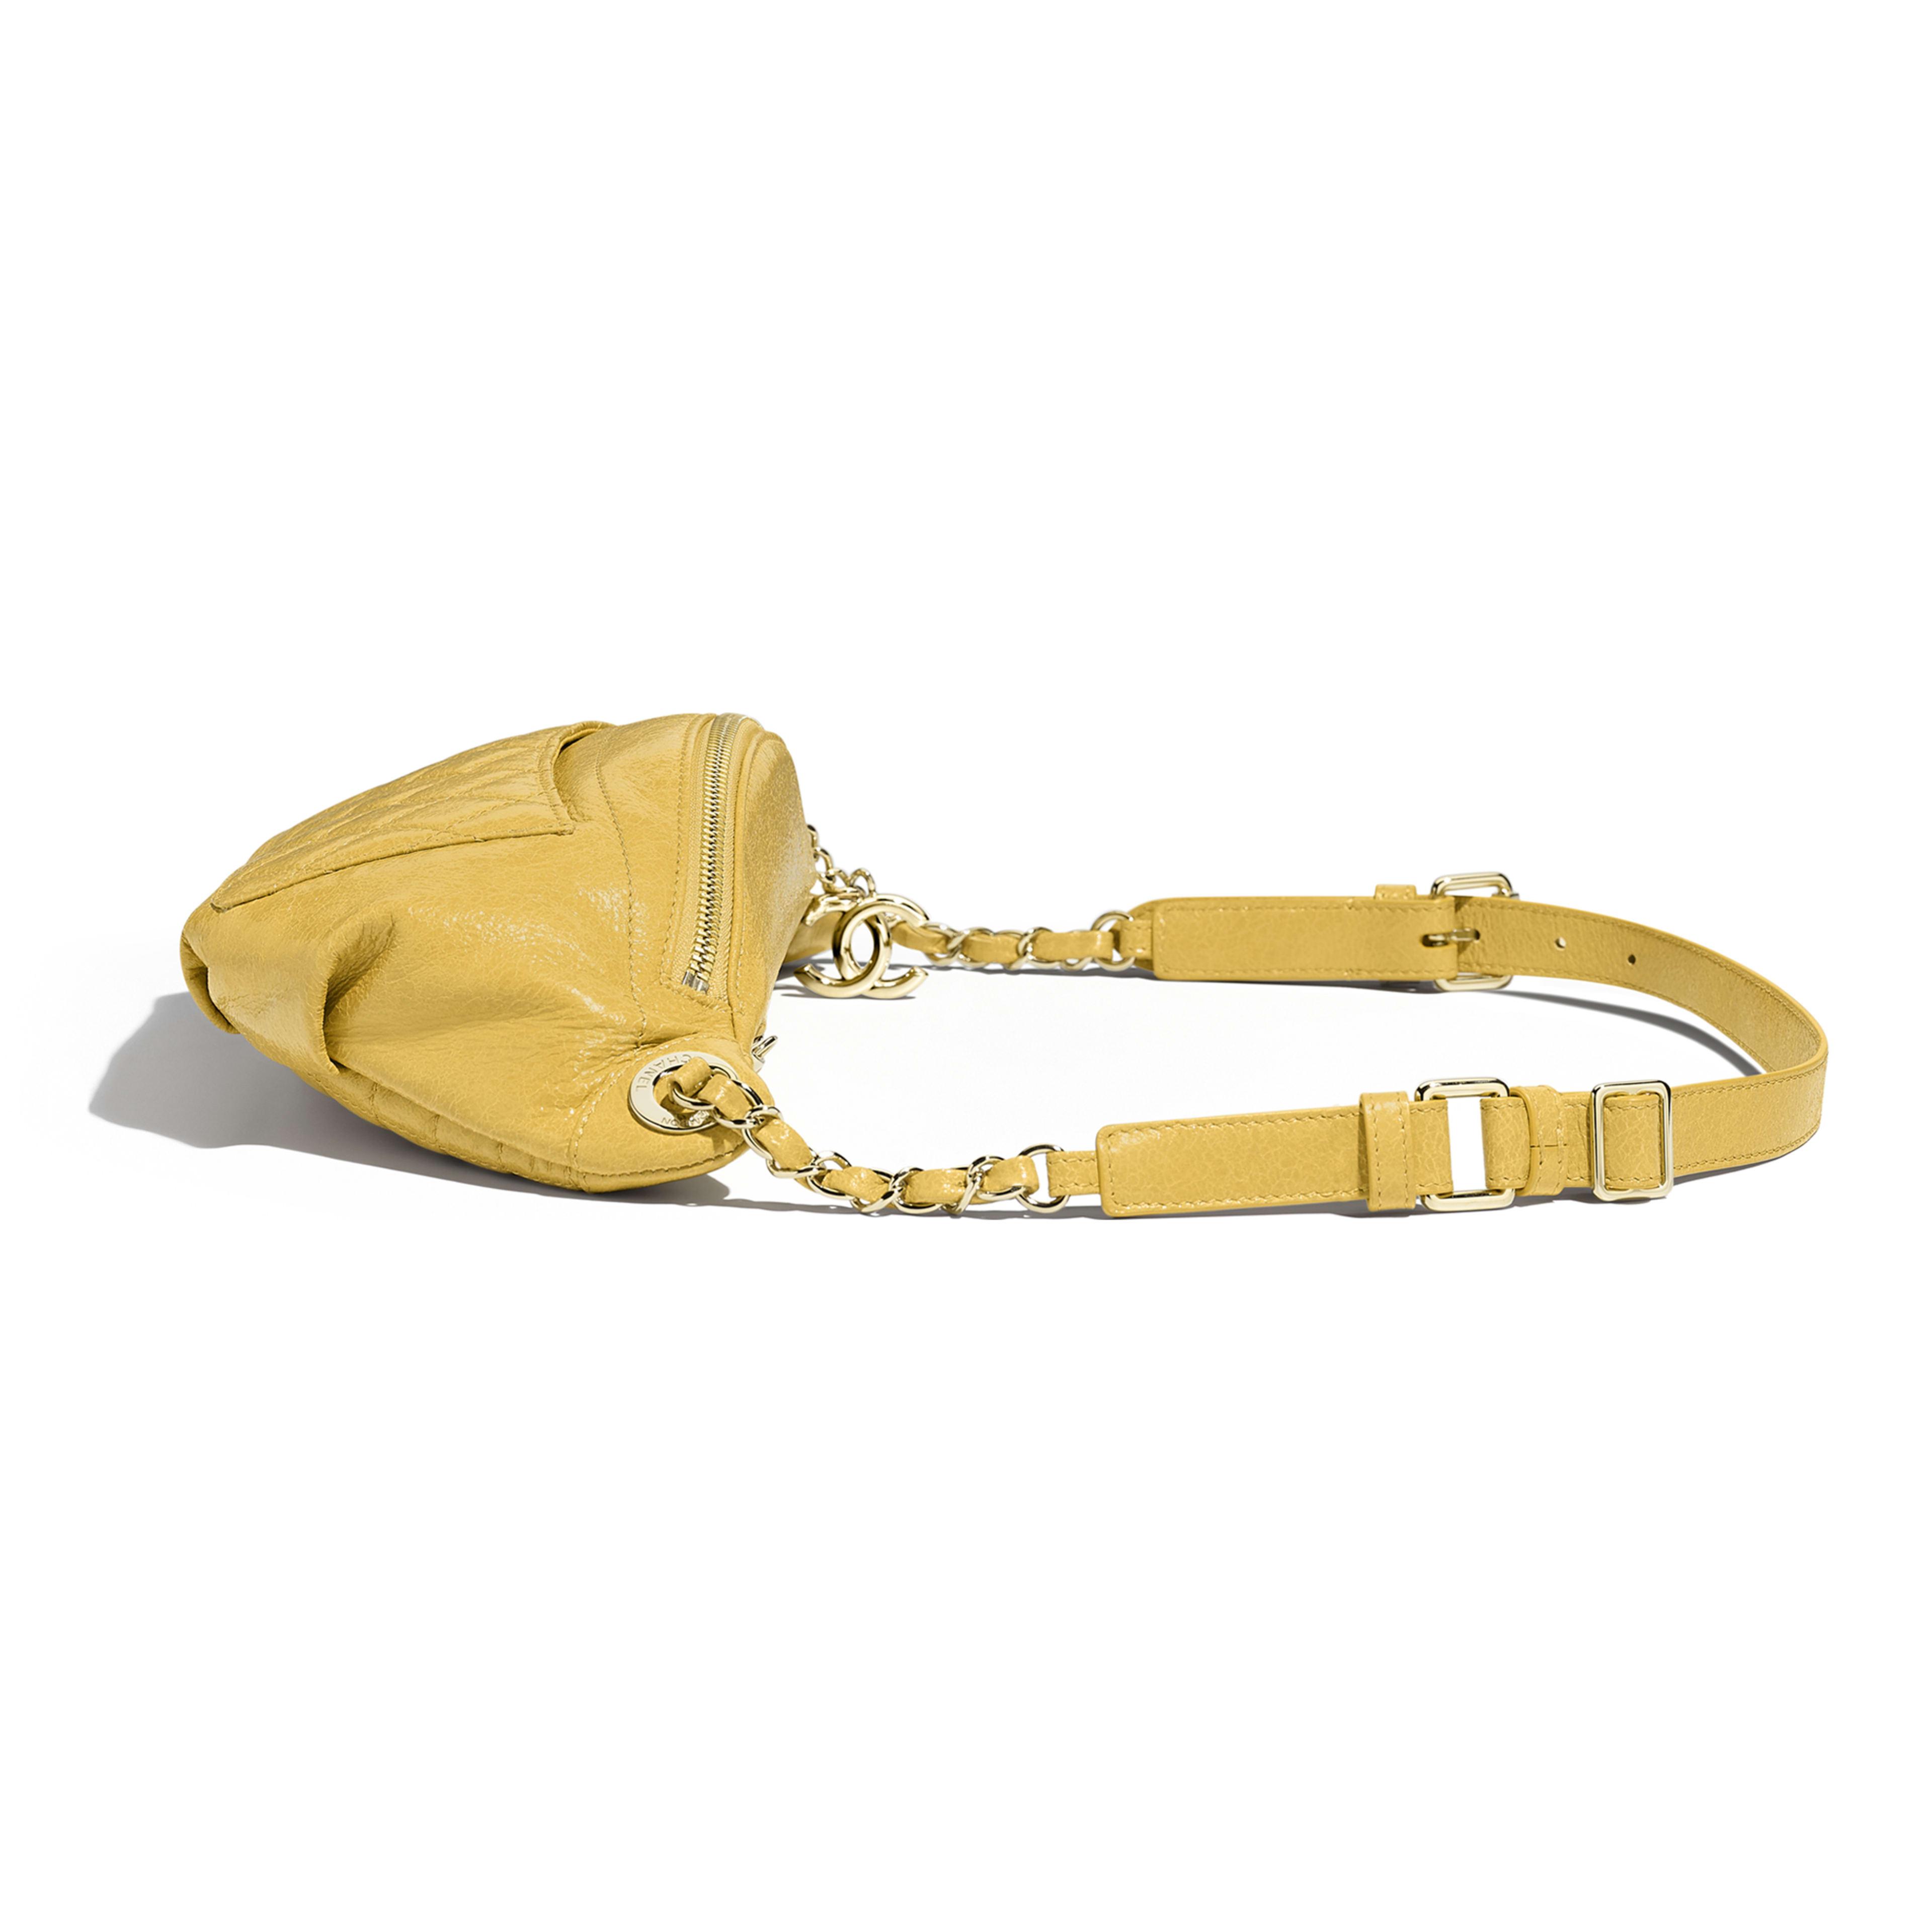 Waist Bag Crumpled Lambskin & Gold-Tone Metal Yellow -                                            view 3 - see full sized version